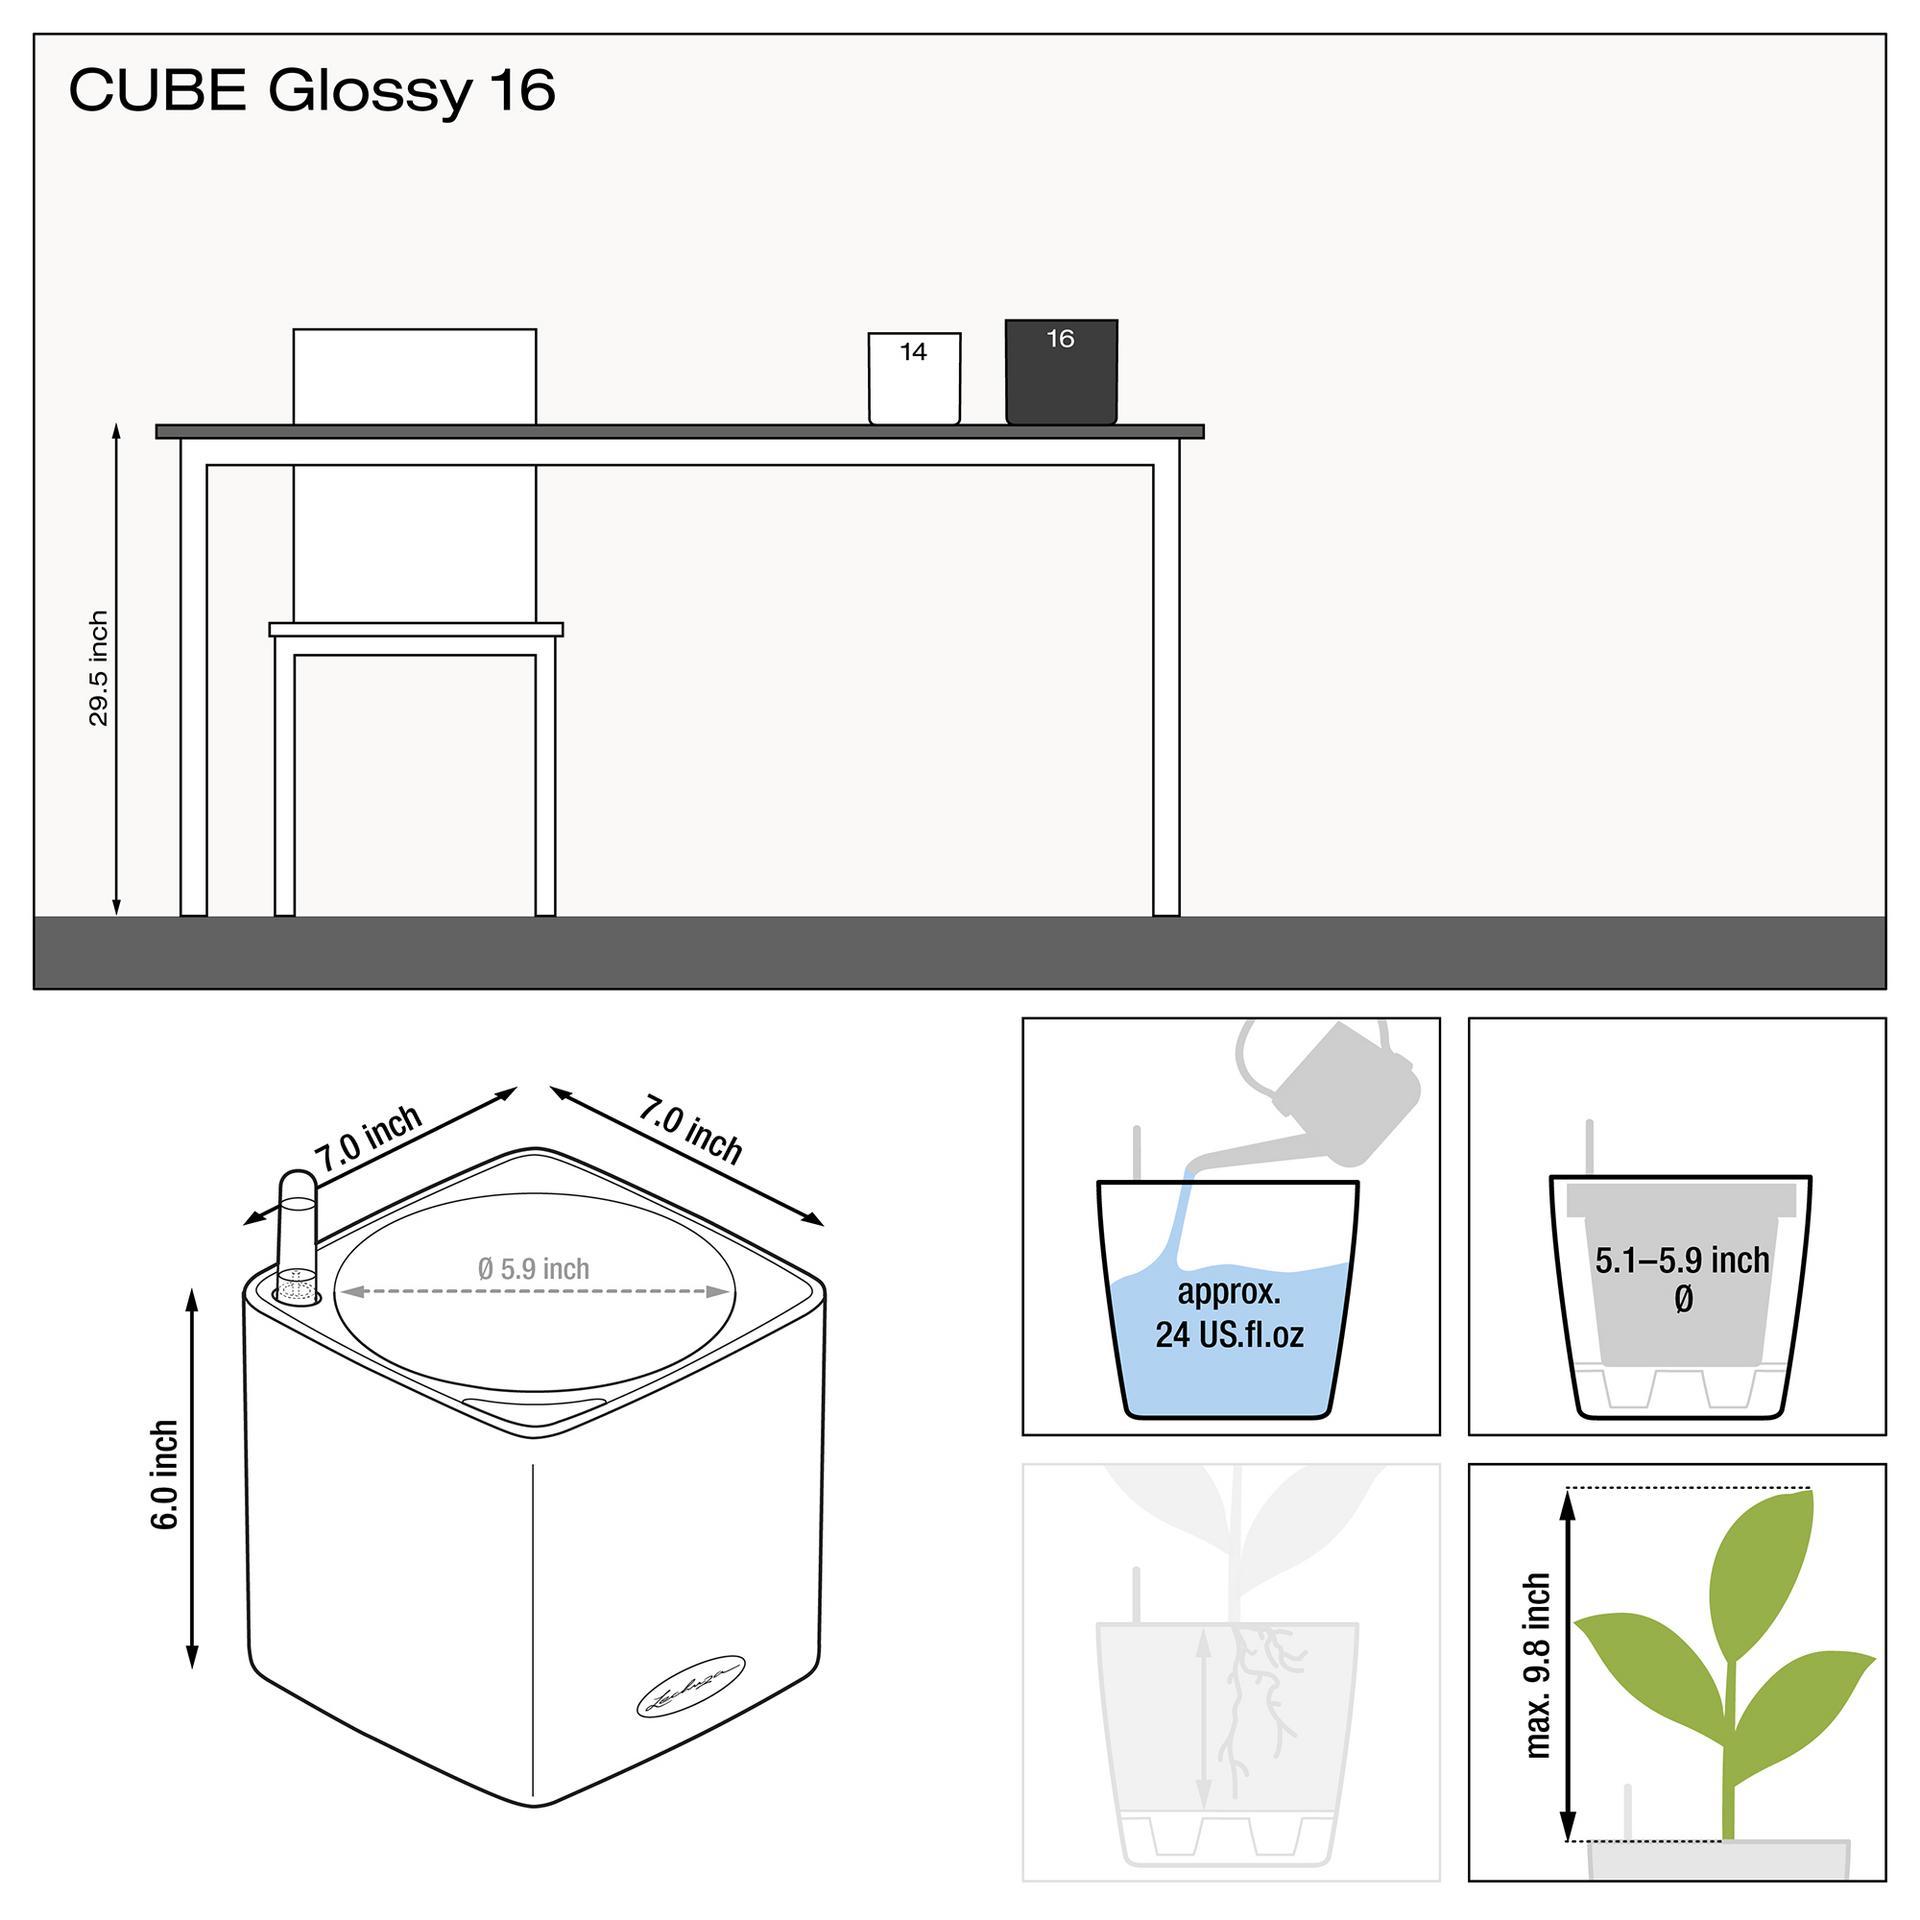 le_cube-glossy16_product_addi_nz_us